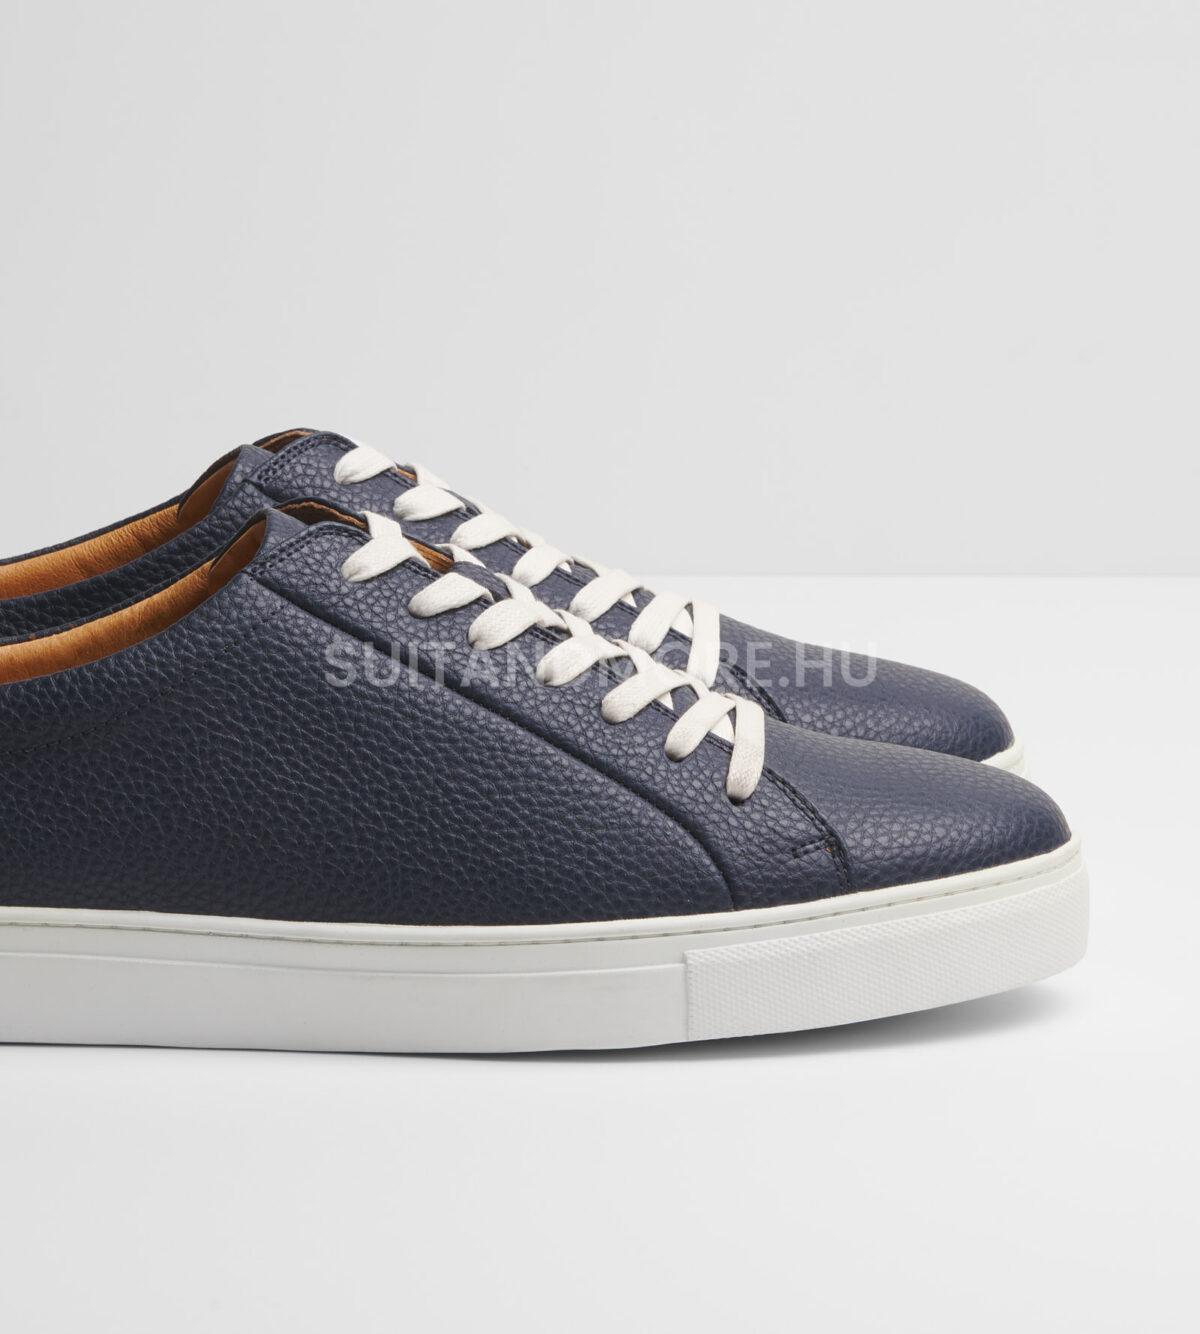 digel-kek-sneaker-cipo-seth-1289704-20-02